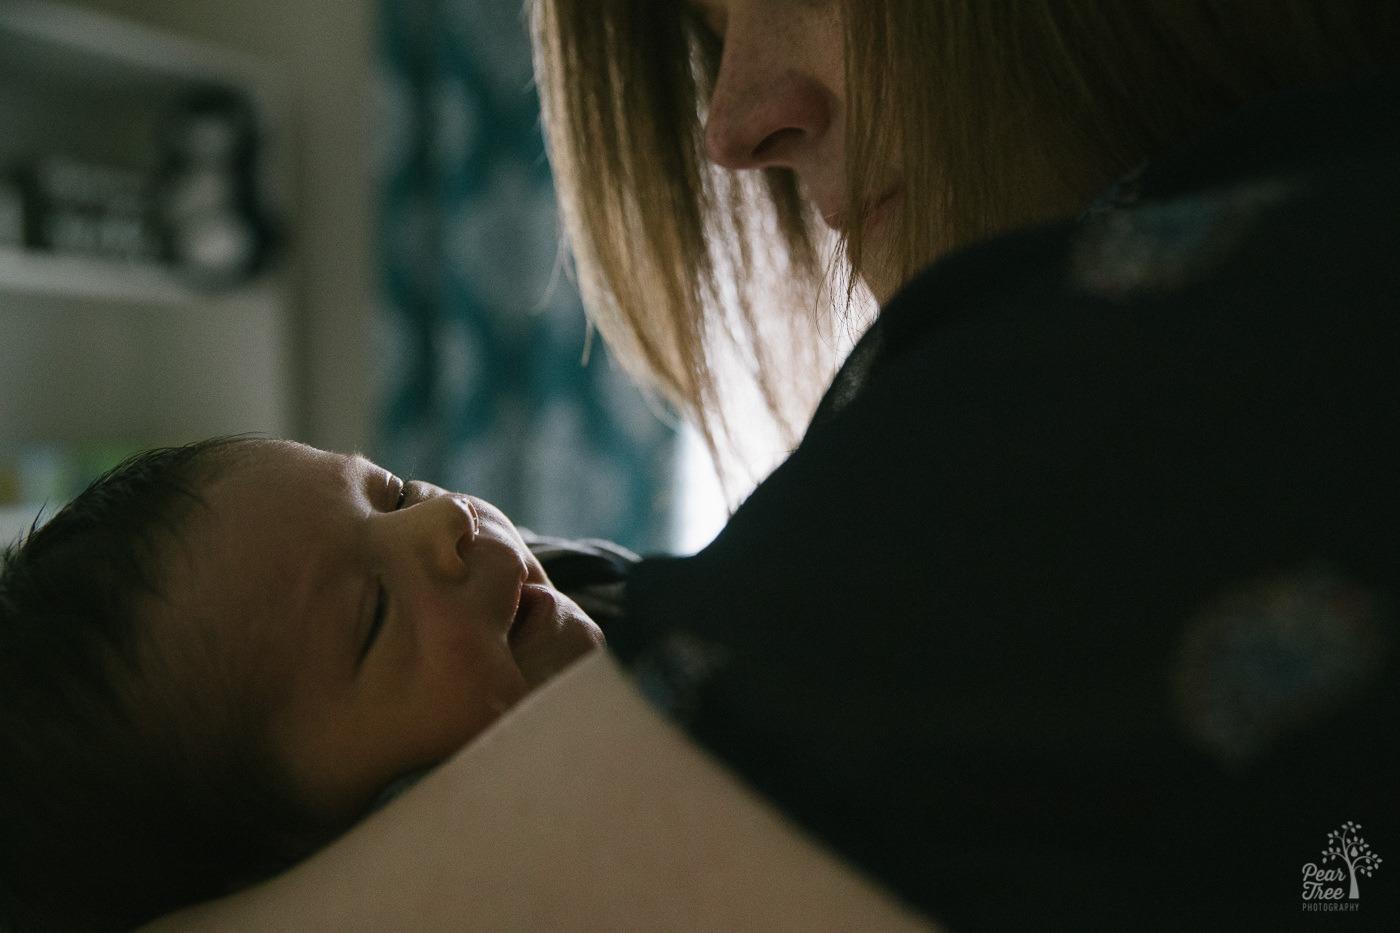 Mom holding her smiling newborn baby boy.